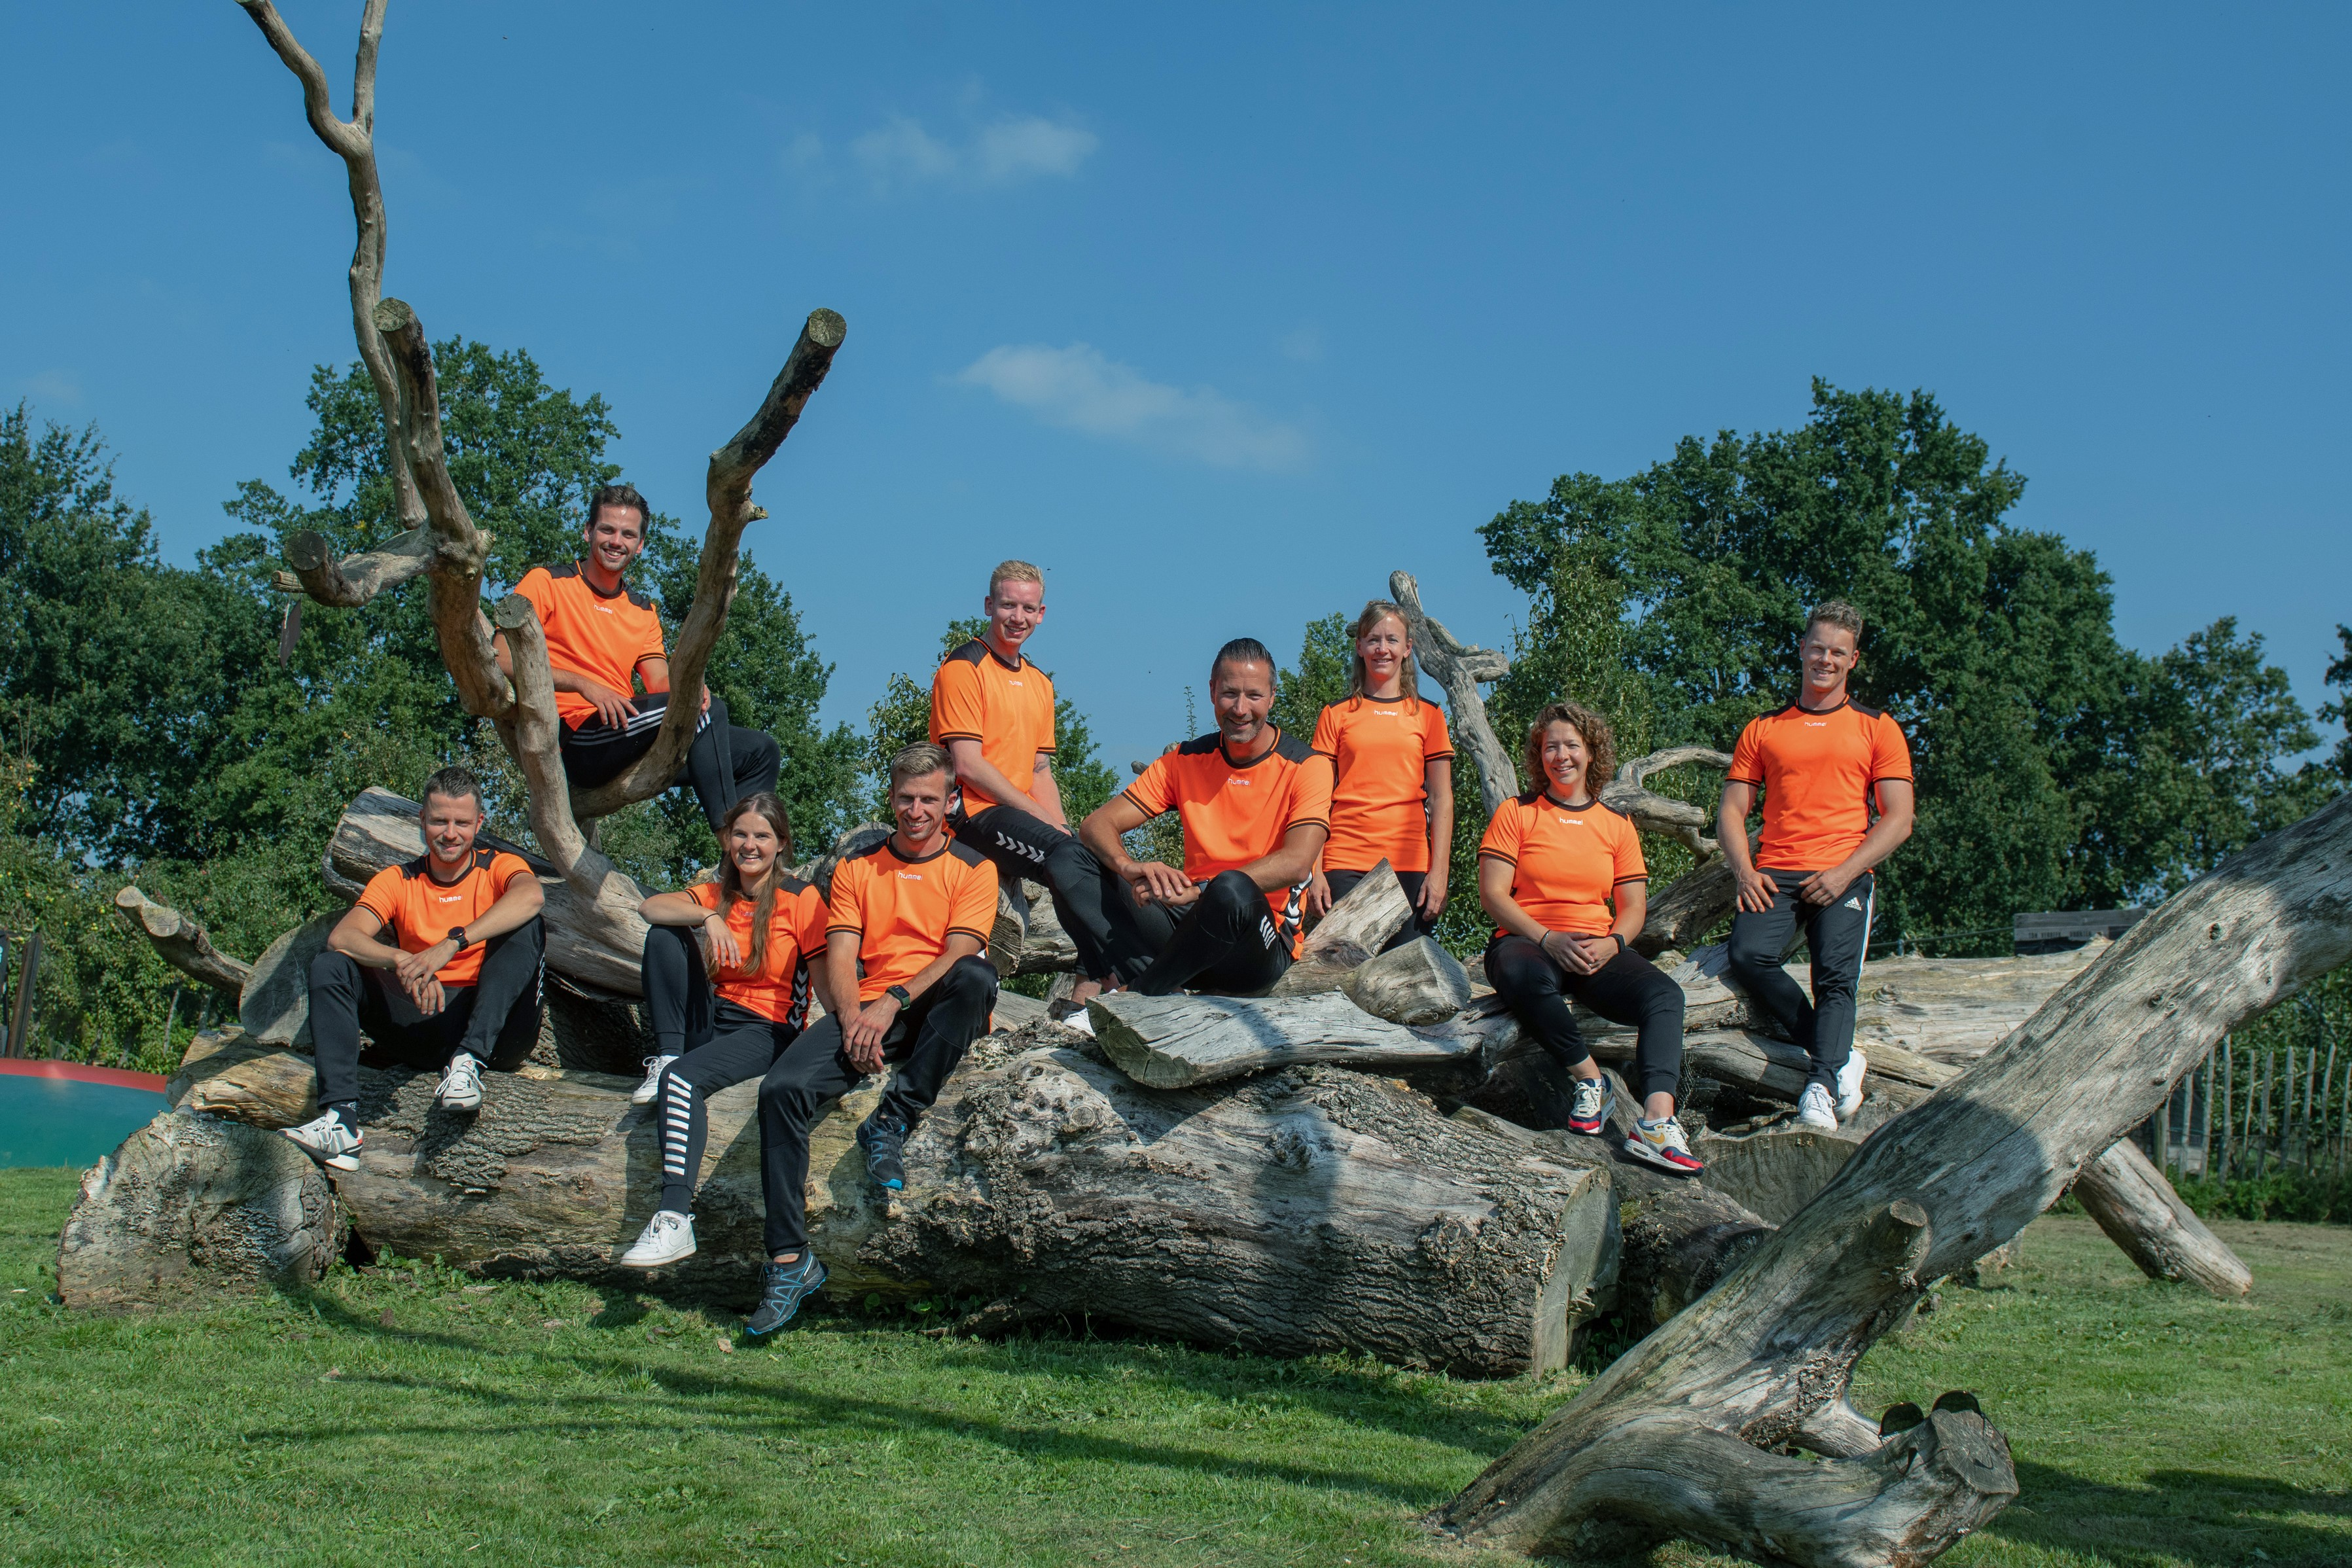 Teamfoto Goed Bezig Oldebroek 2020